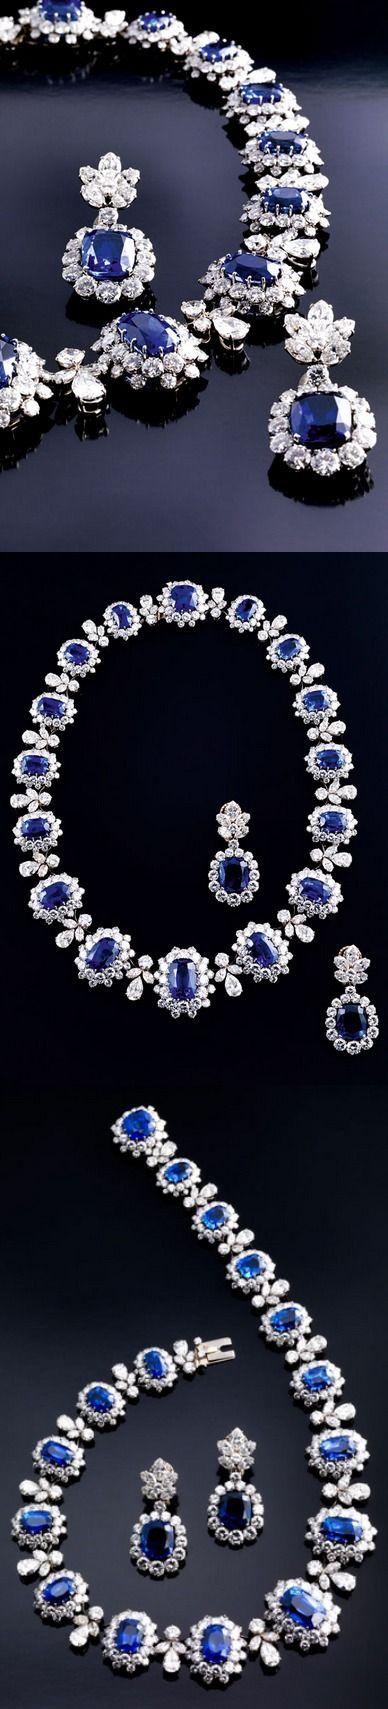 Diamond & sapphire necklace & earrings, Bulgari.